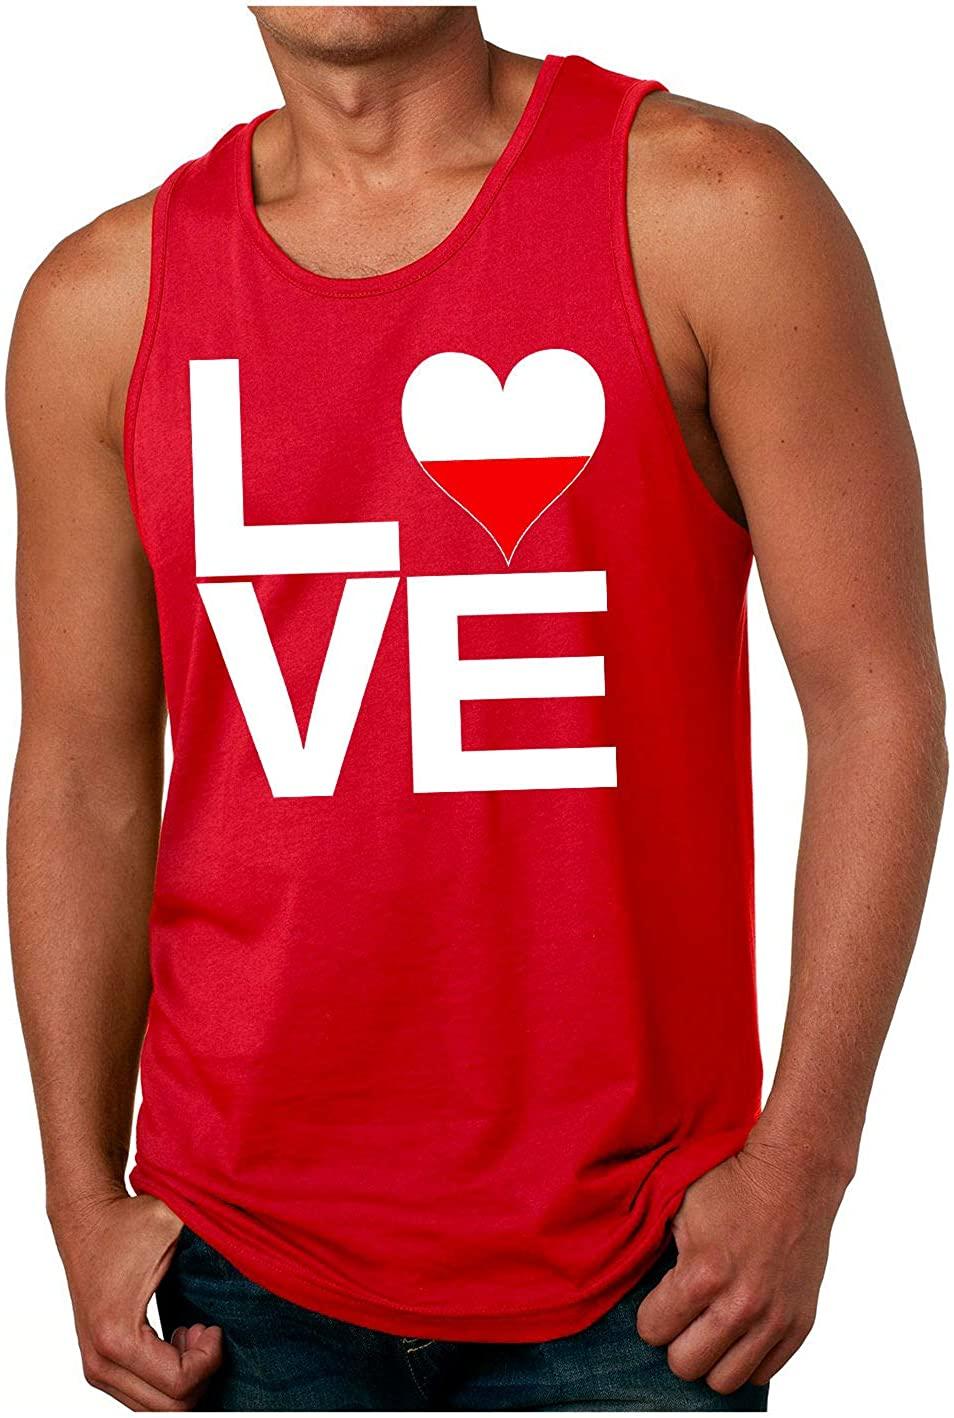 HARD EDGE DESIGN Men's Love Block Poland Heart Tank Top, Large, Red